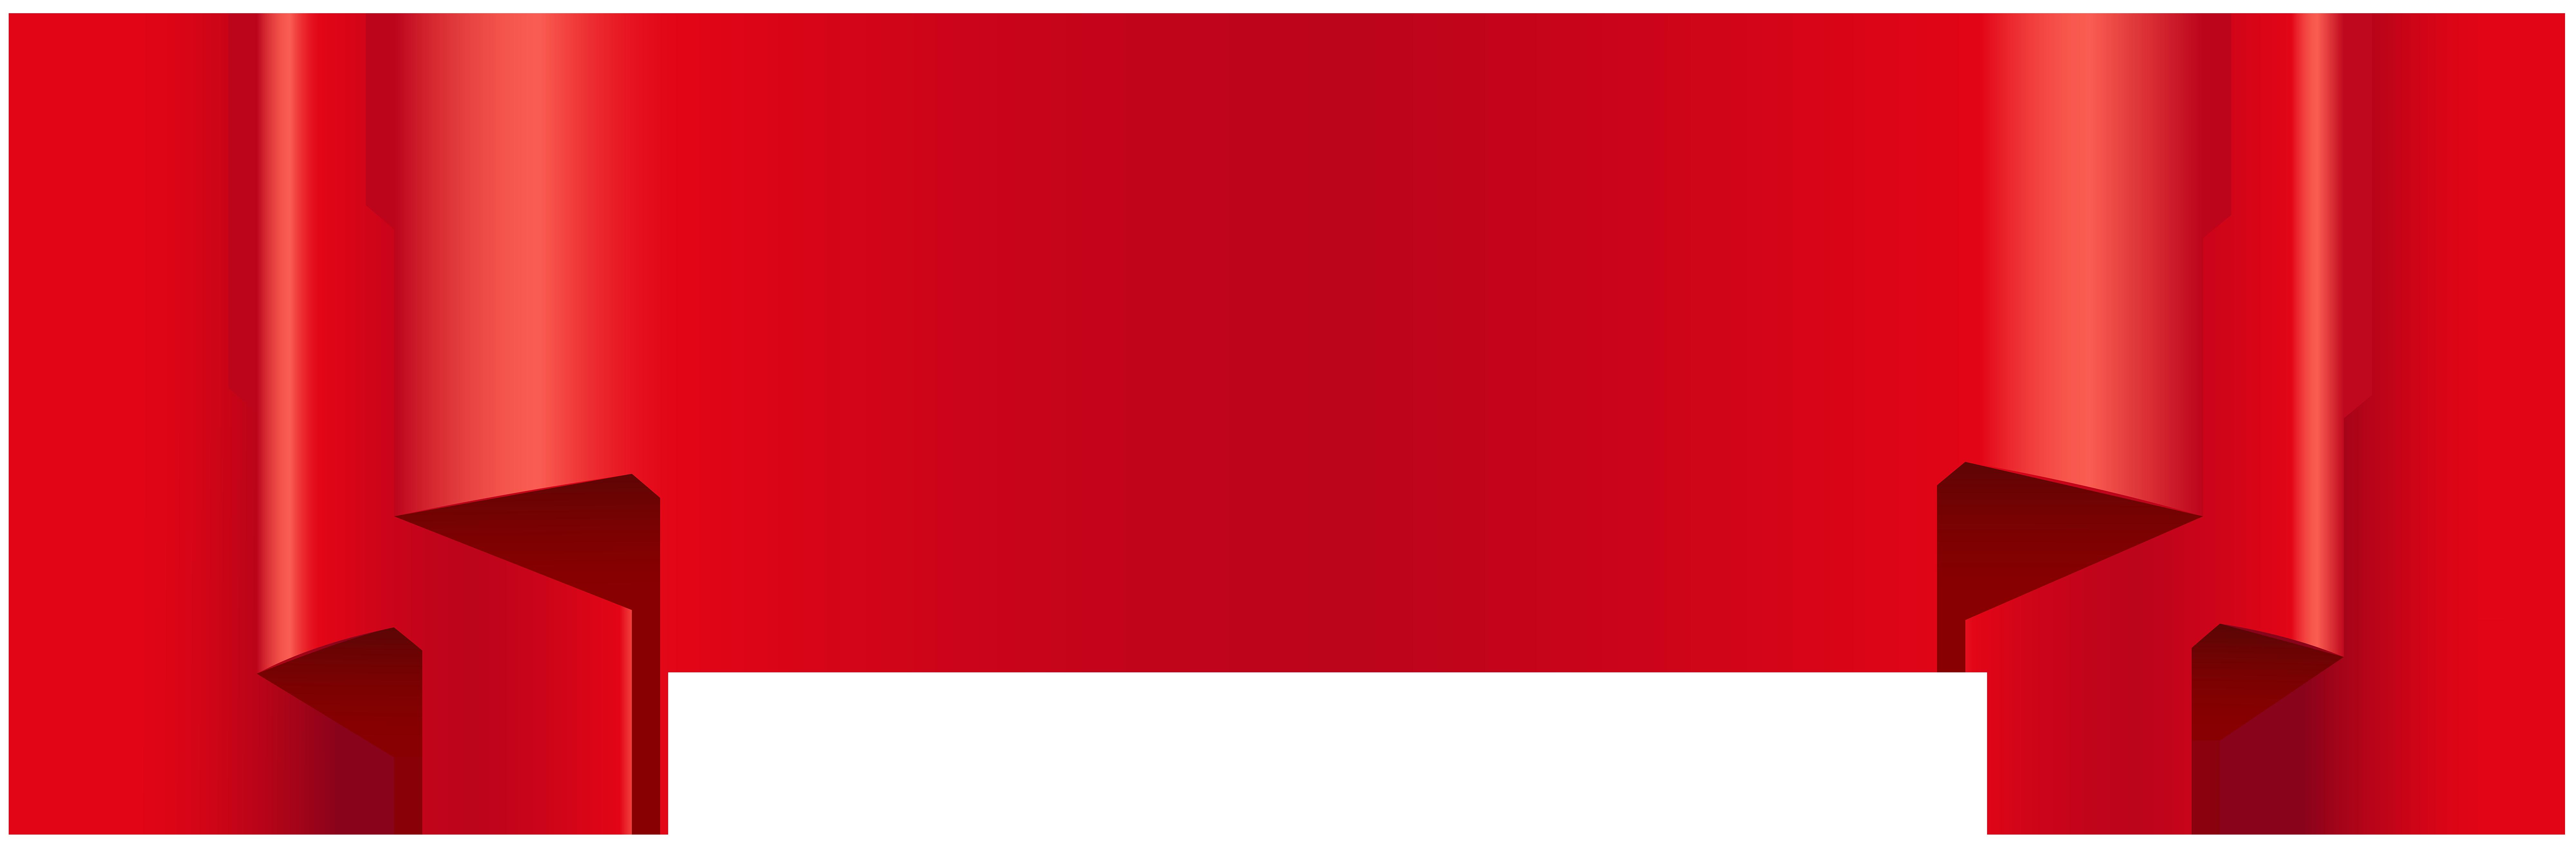 Red Banner Transparent Clip Art.